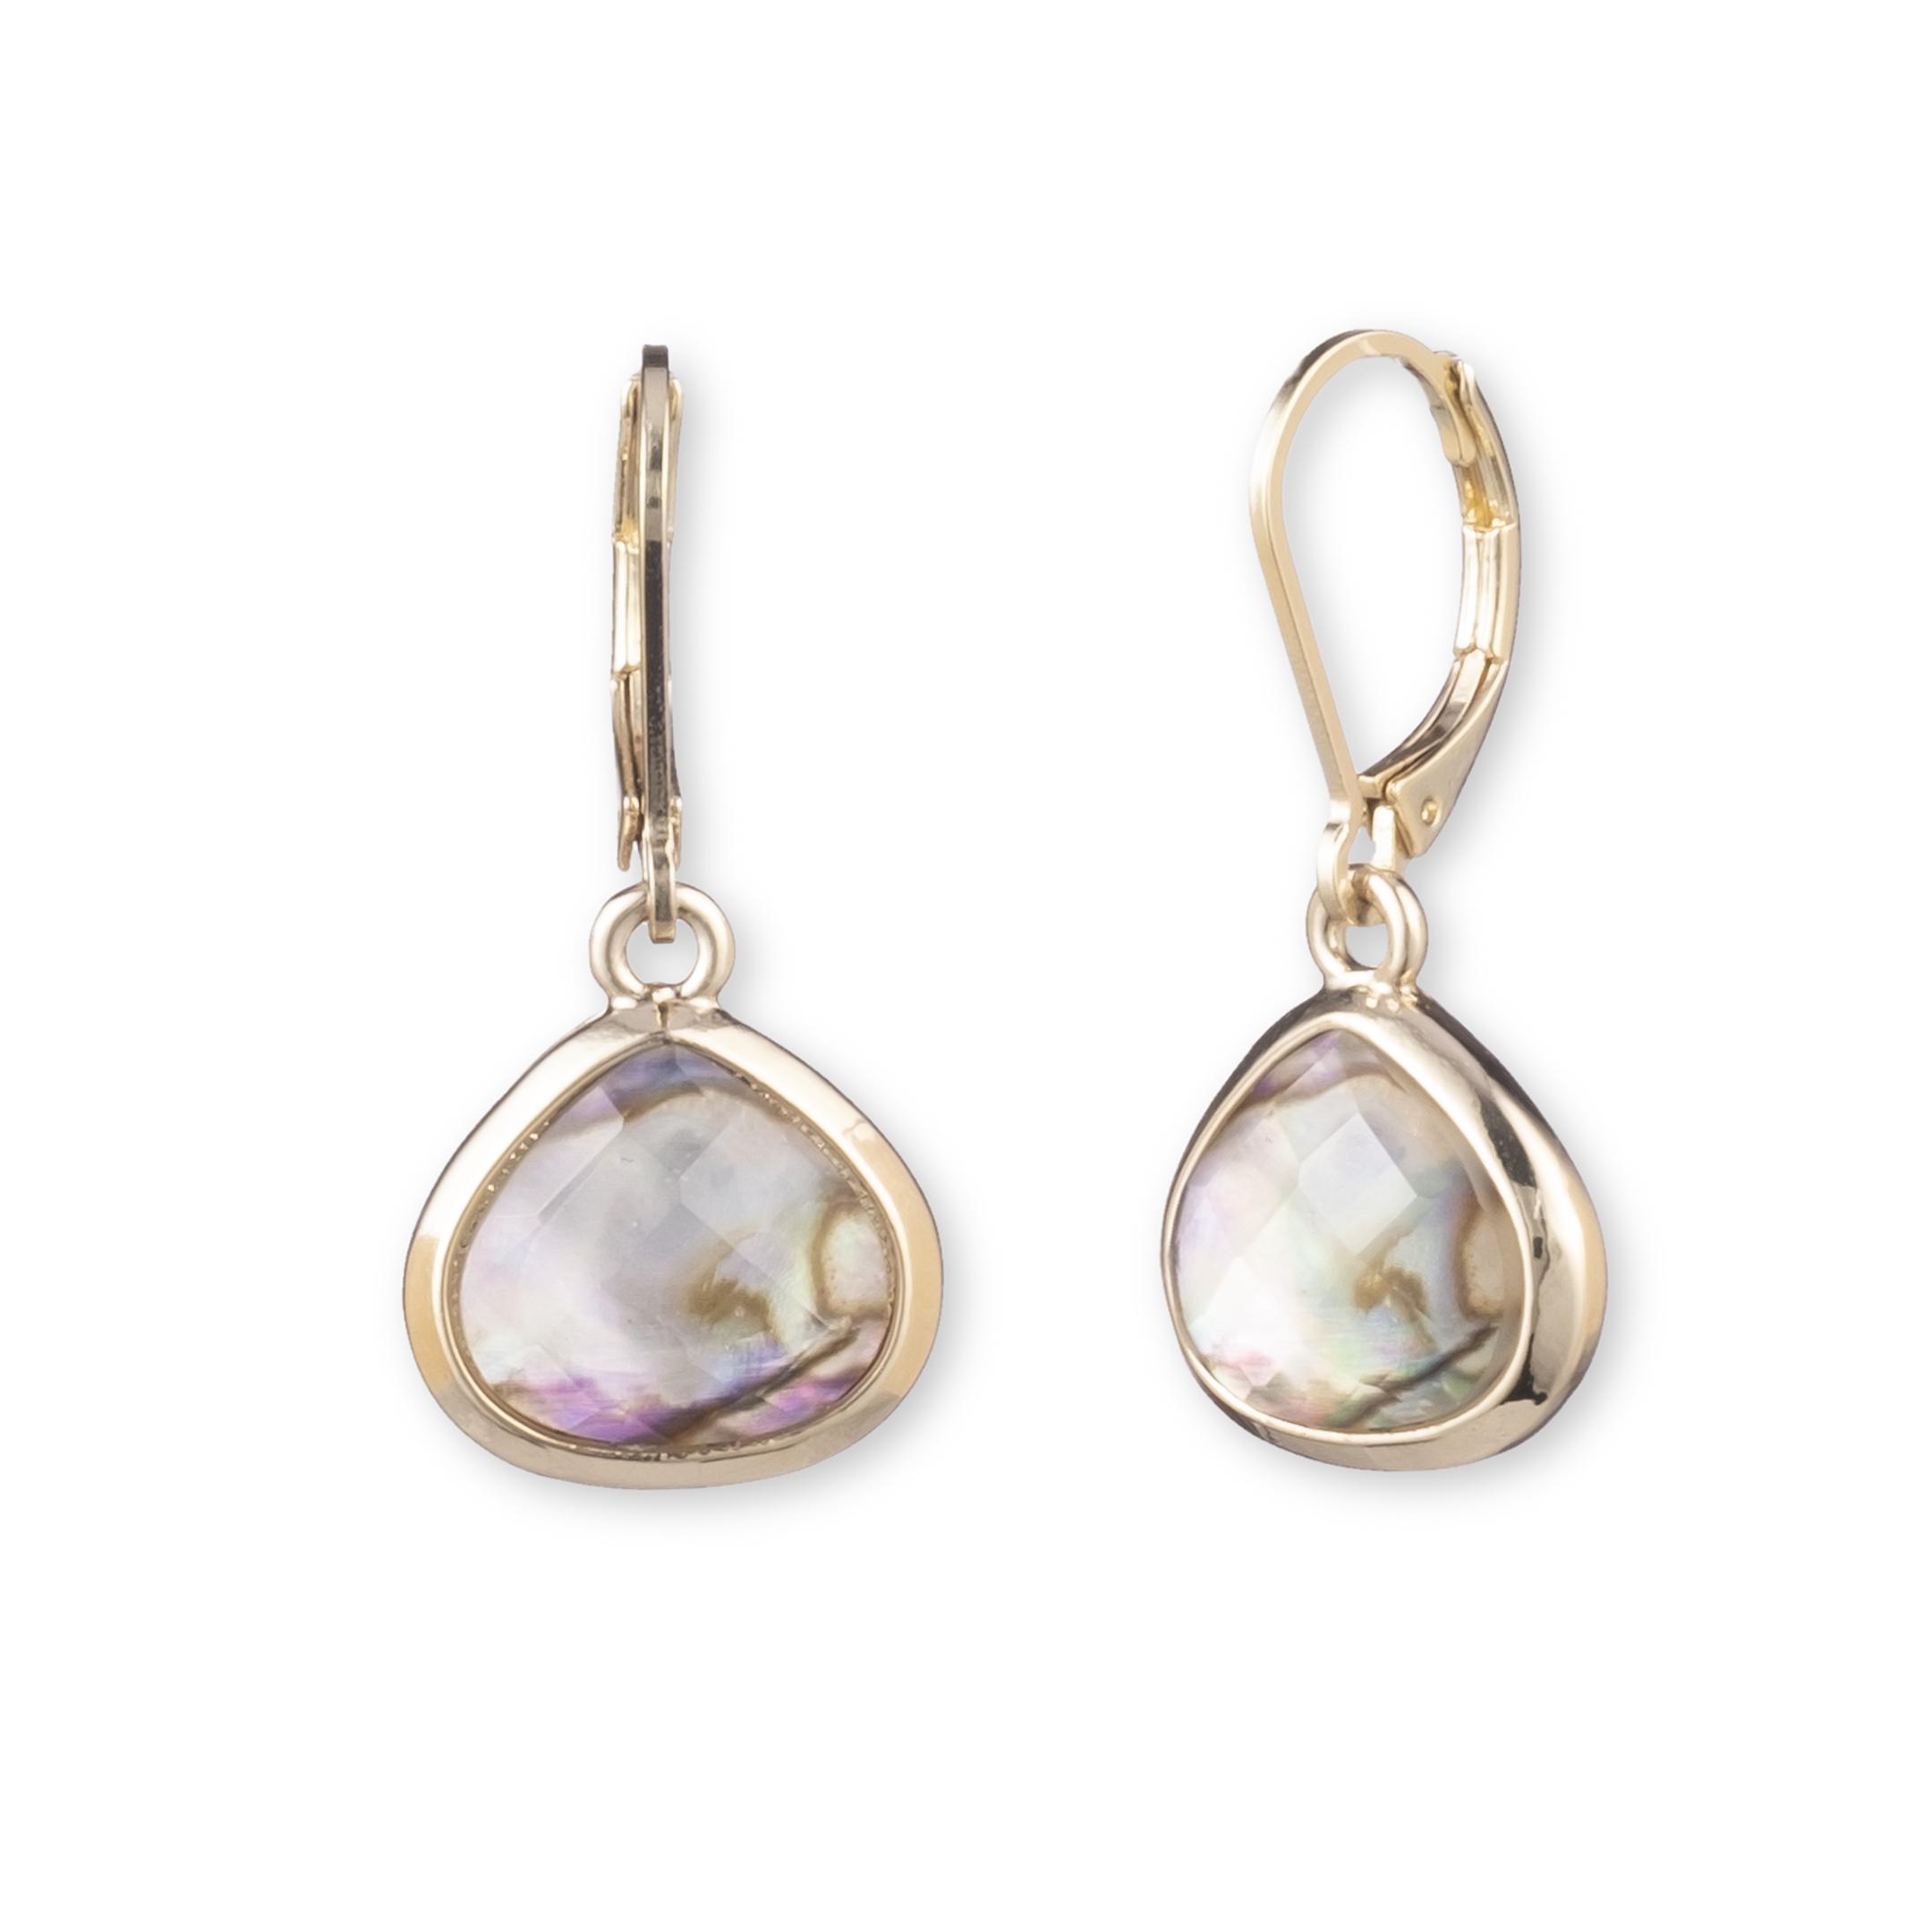 Anne Klein x BCRF Shop Pink Earring